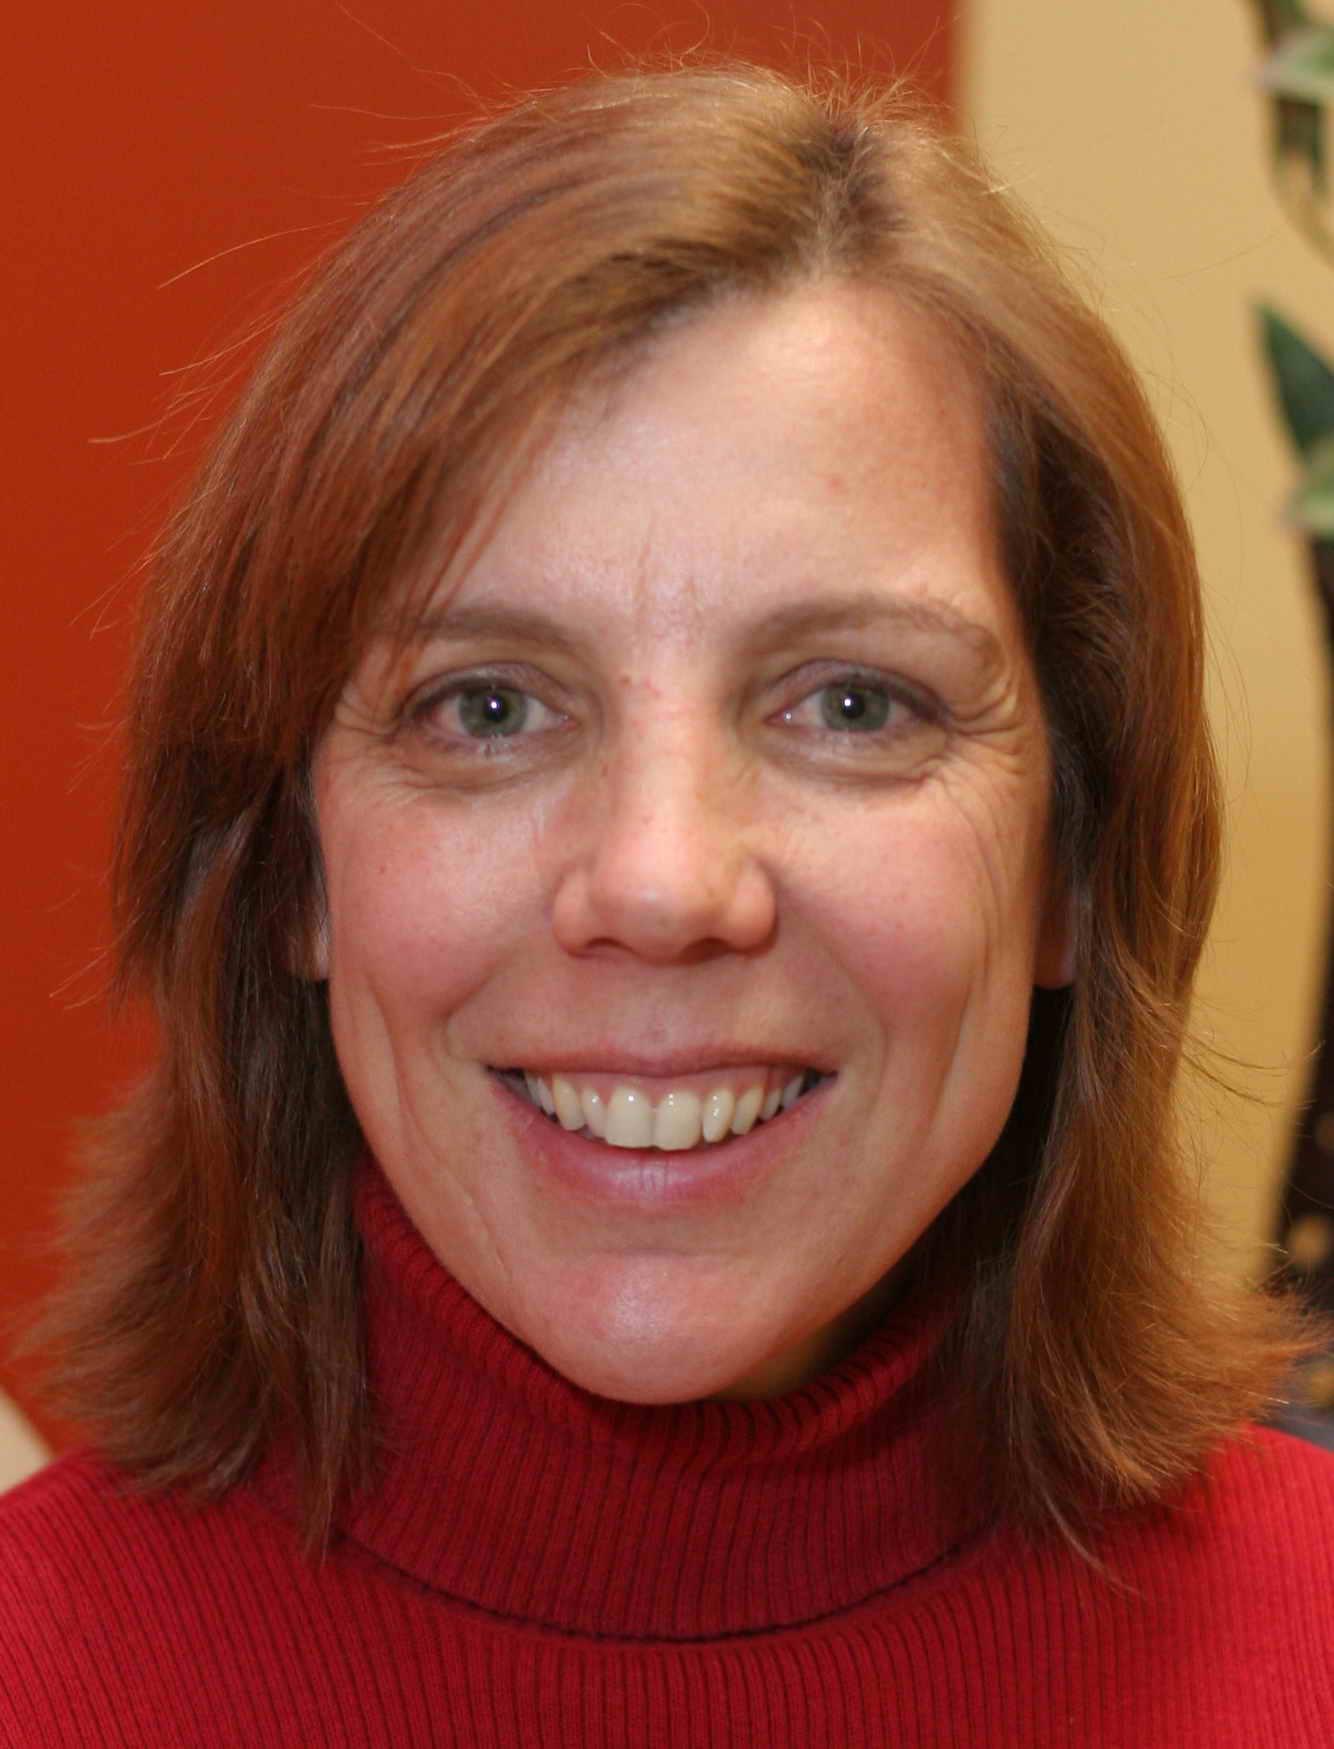 Sara Kirk, PhD., Canada Research Chair in Health Services Research, Dalhousie University, Halifax, Nova Scotia